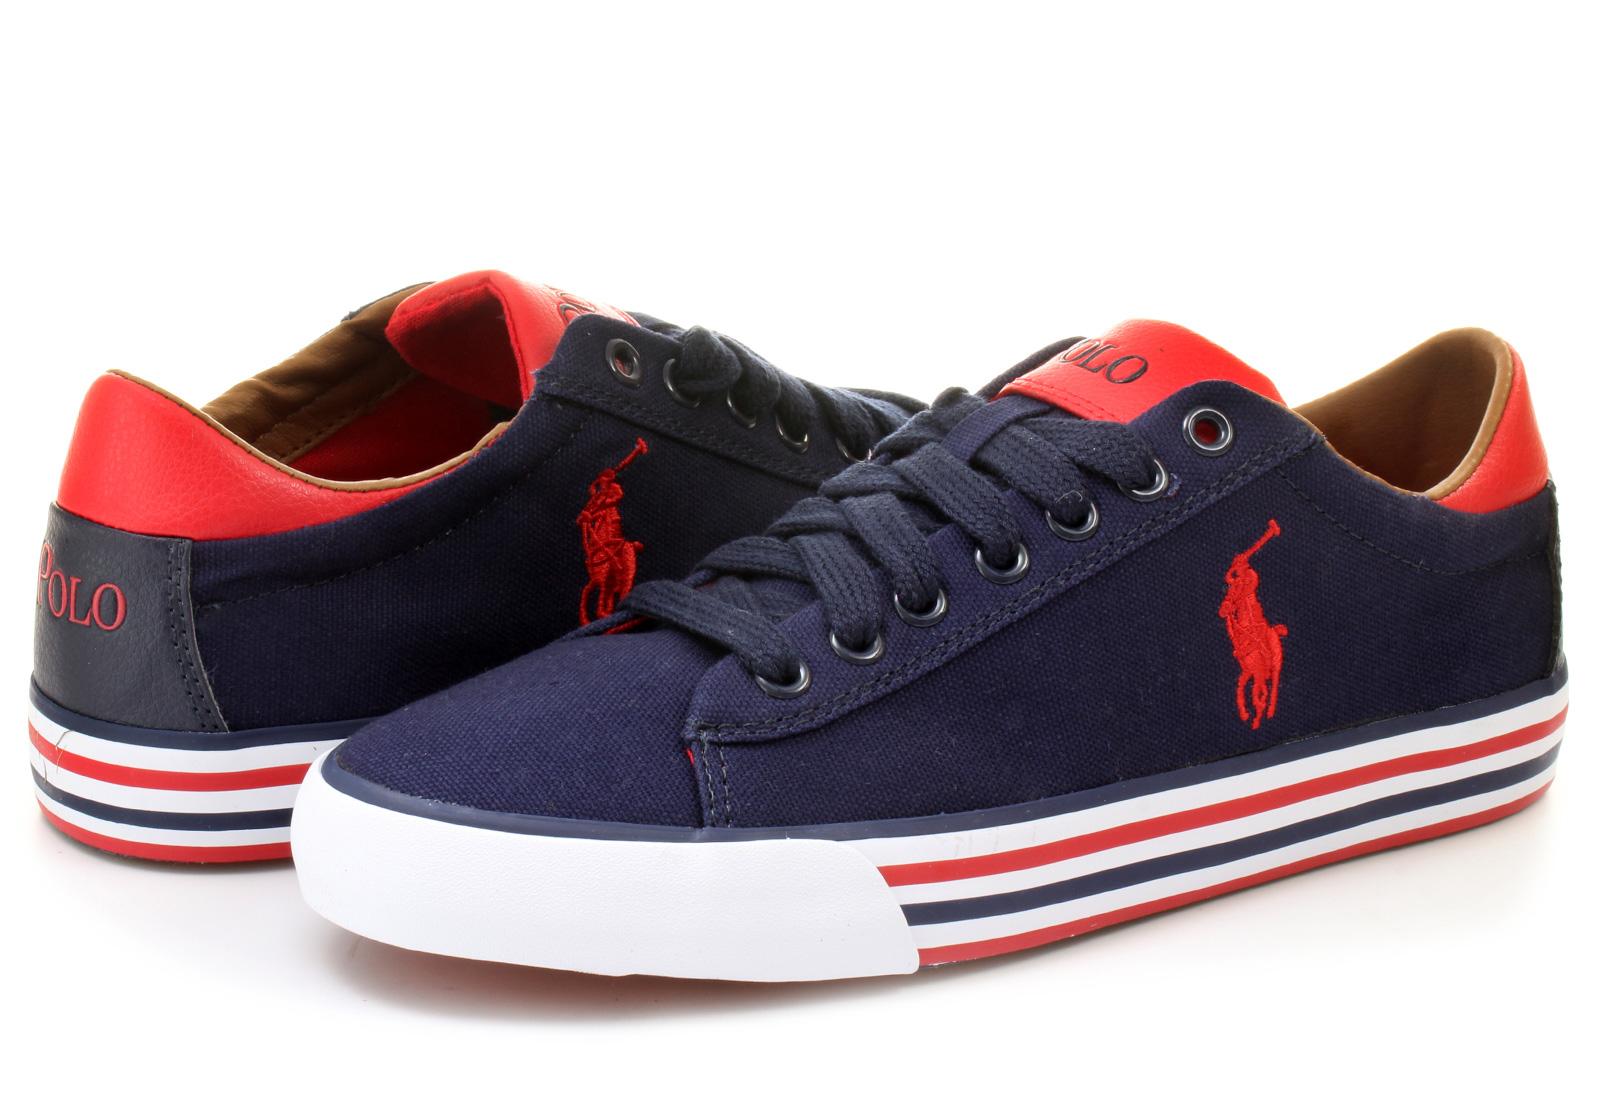 0073b348237 Polo Ralph Lauren Shoes - Harvey - Ne - 8161907580GB - Online ...